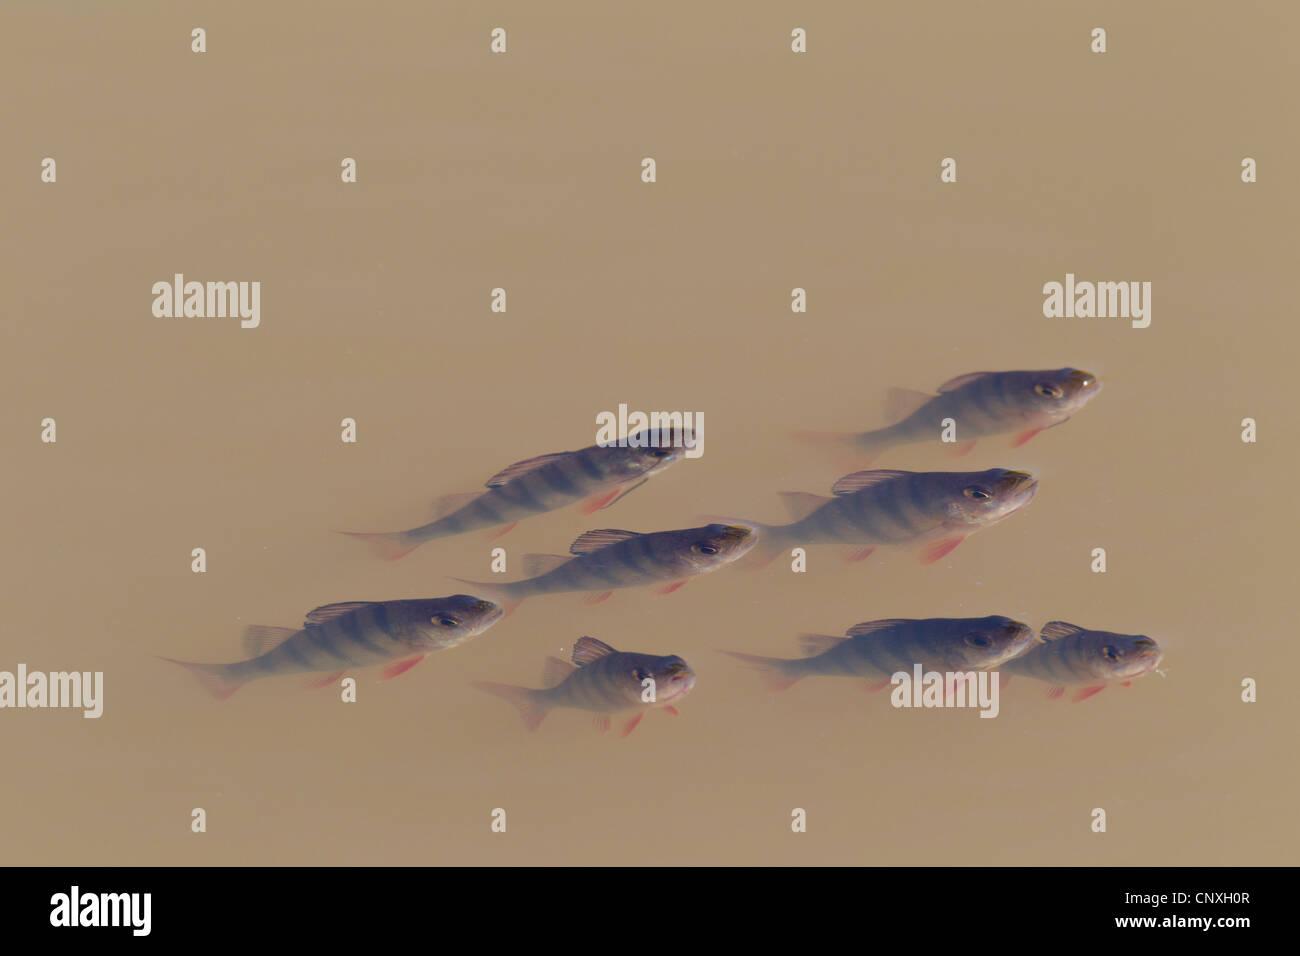 Perch, European perch, Redfin perch (Perca fluviatilis), juveniles, Germany, Saxony, Oberlausitz - Stock Image